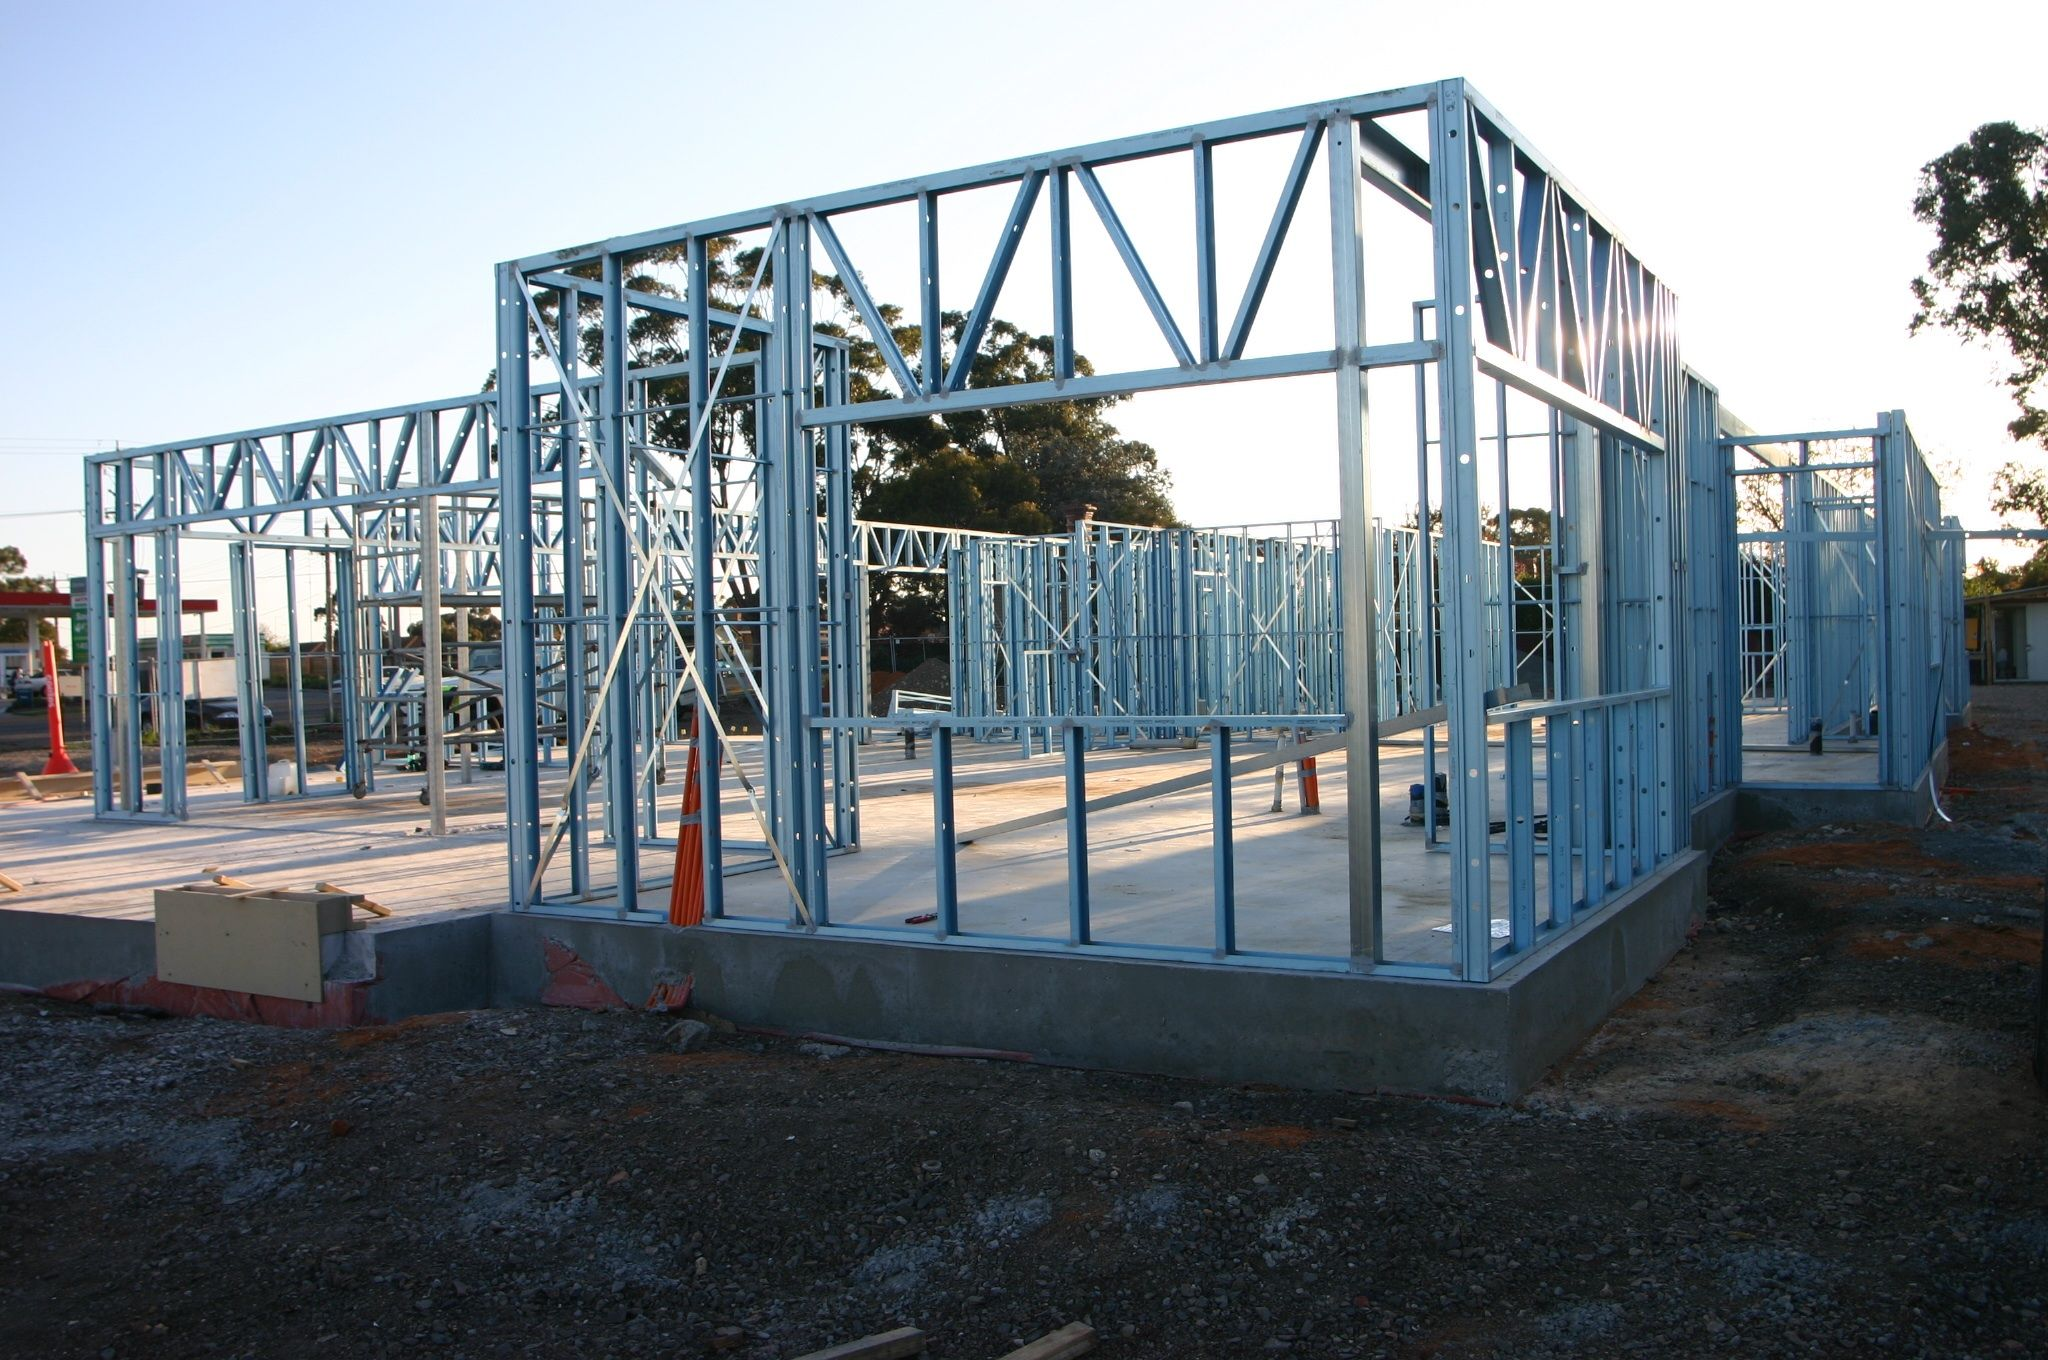 steel-kit-homes-large.jpg (2048×1360)   Detalles - Construcción ...